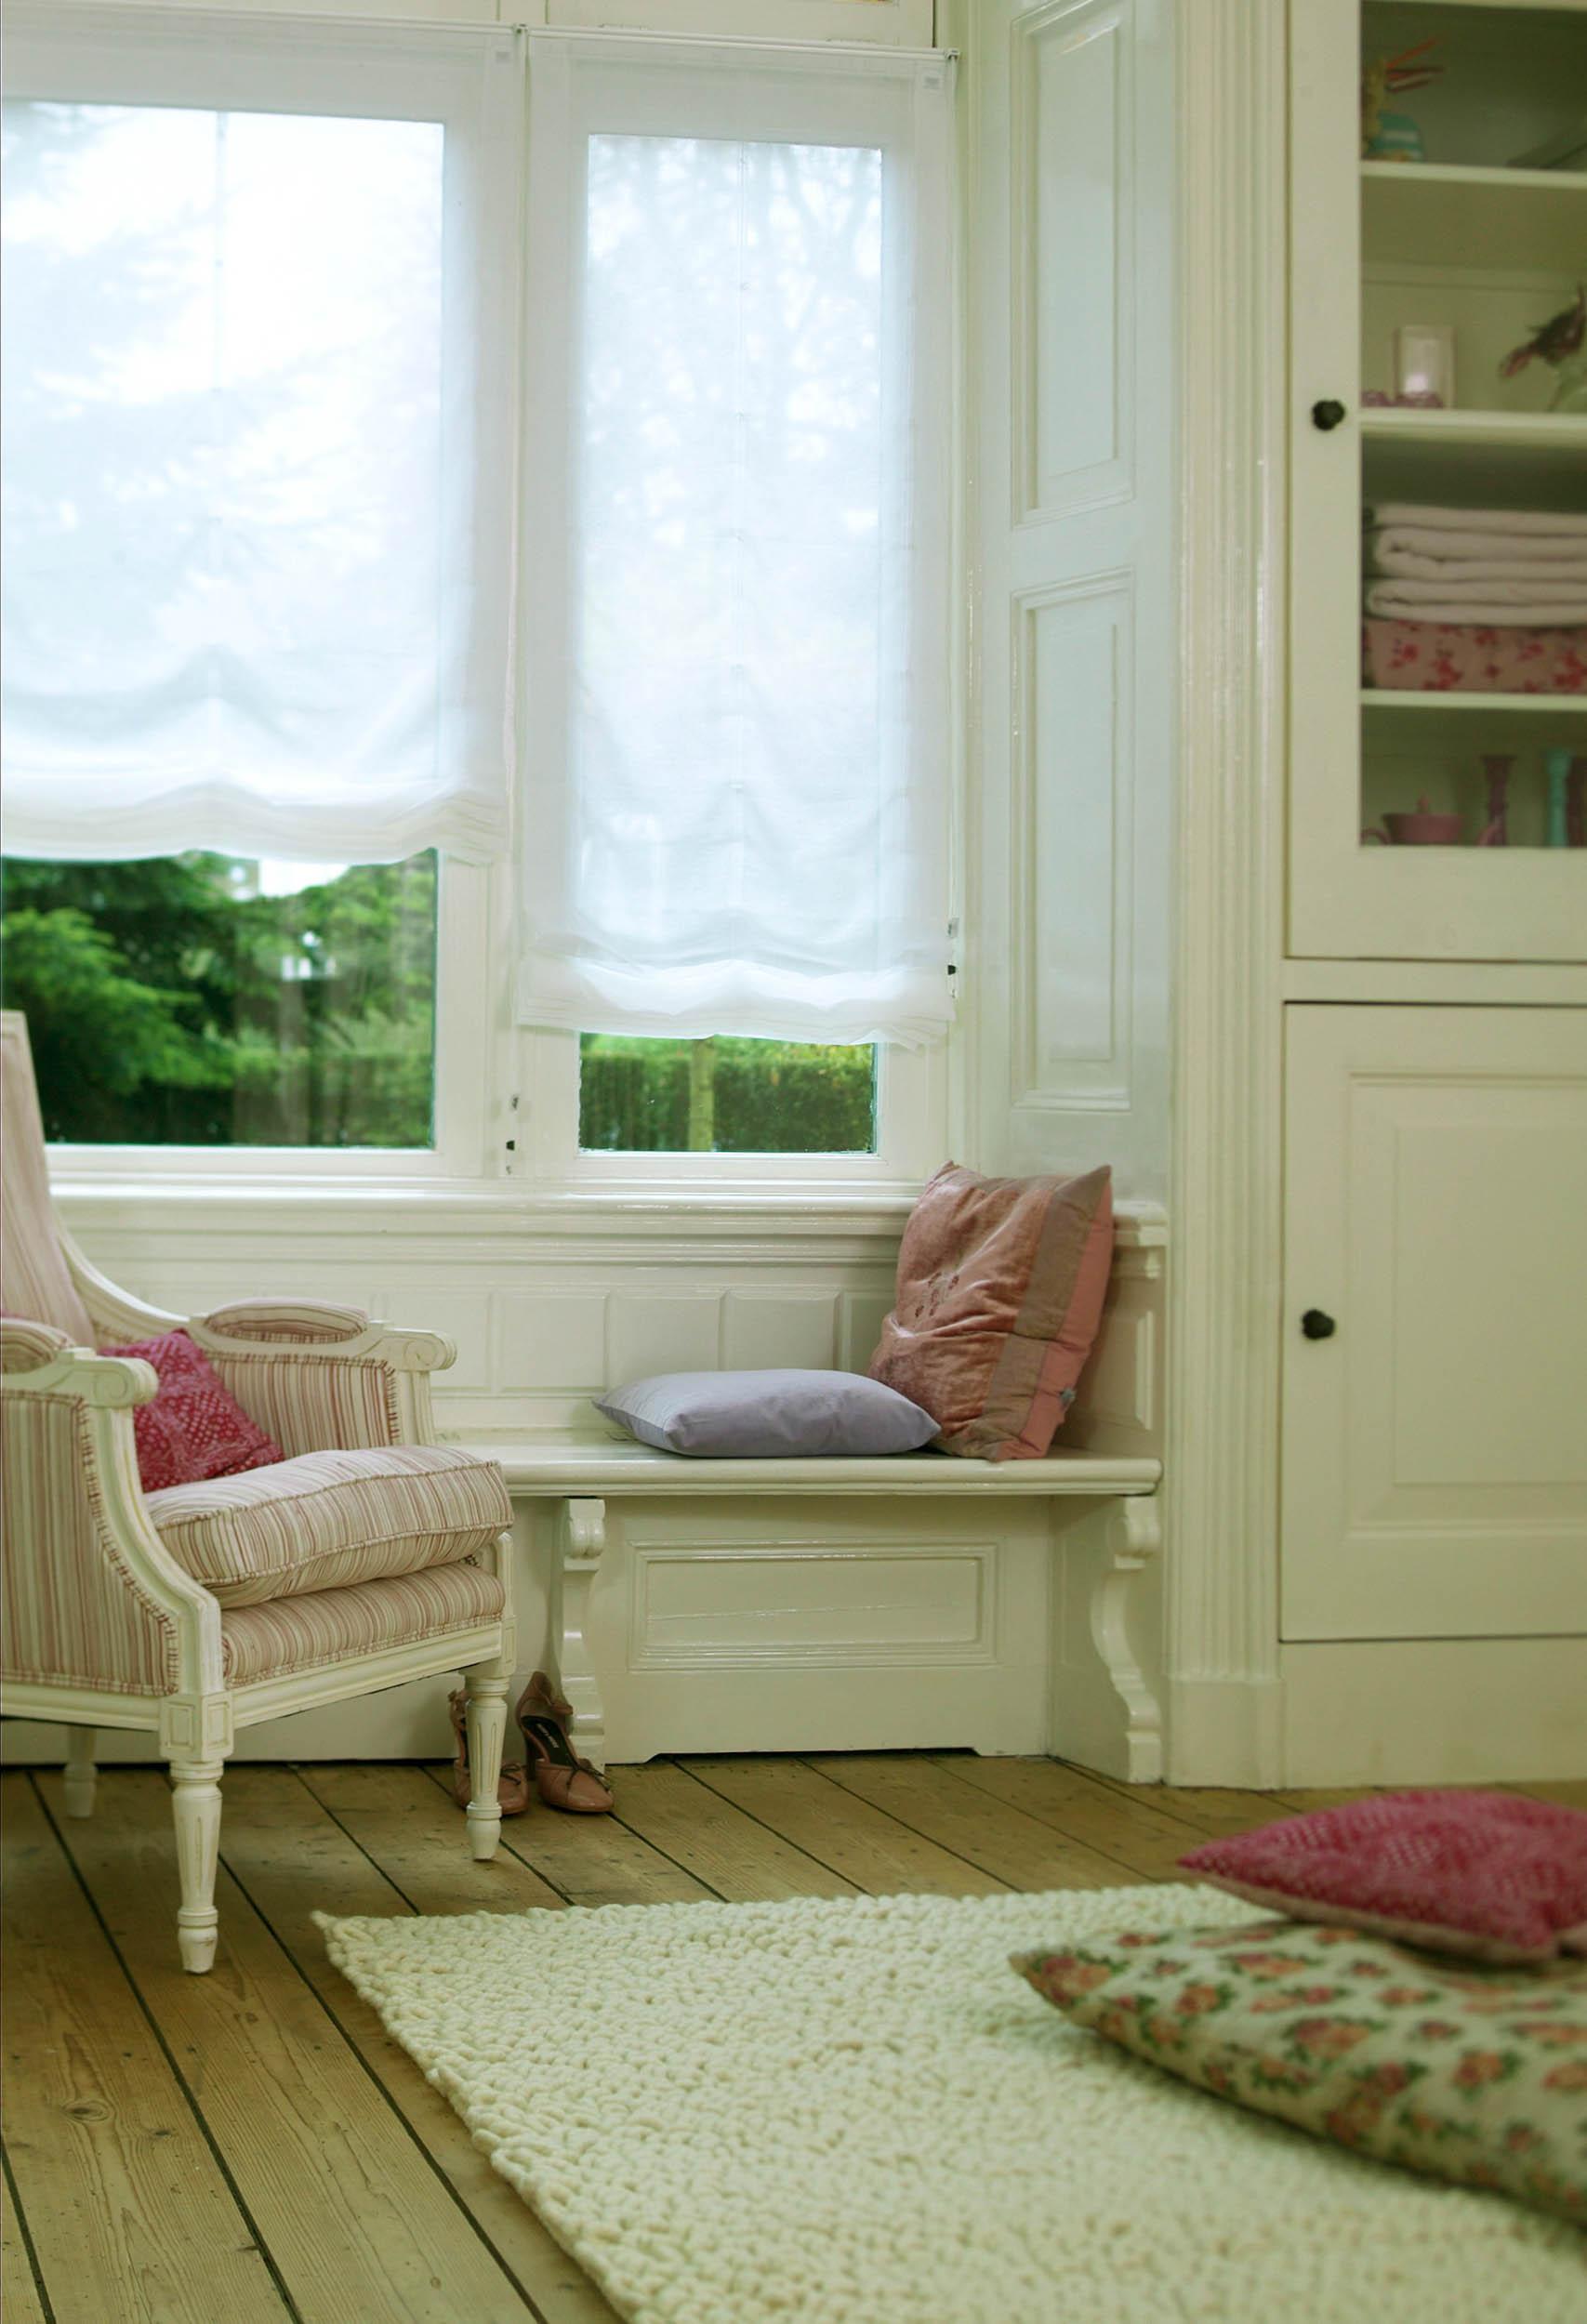 raffrollo schiene simple with raffrollo schiene best raffrollo rustica kutti mit klettband. Black Bedroom Furniture Sets. Home Design Ideas